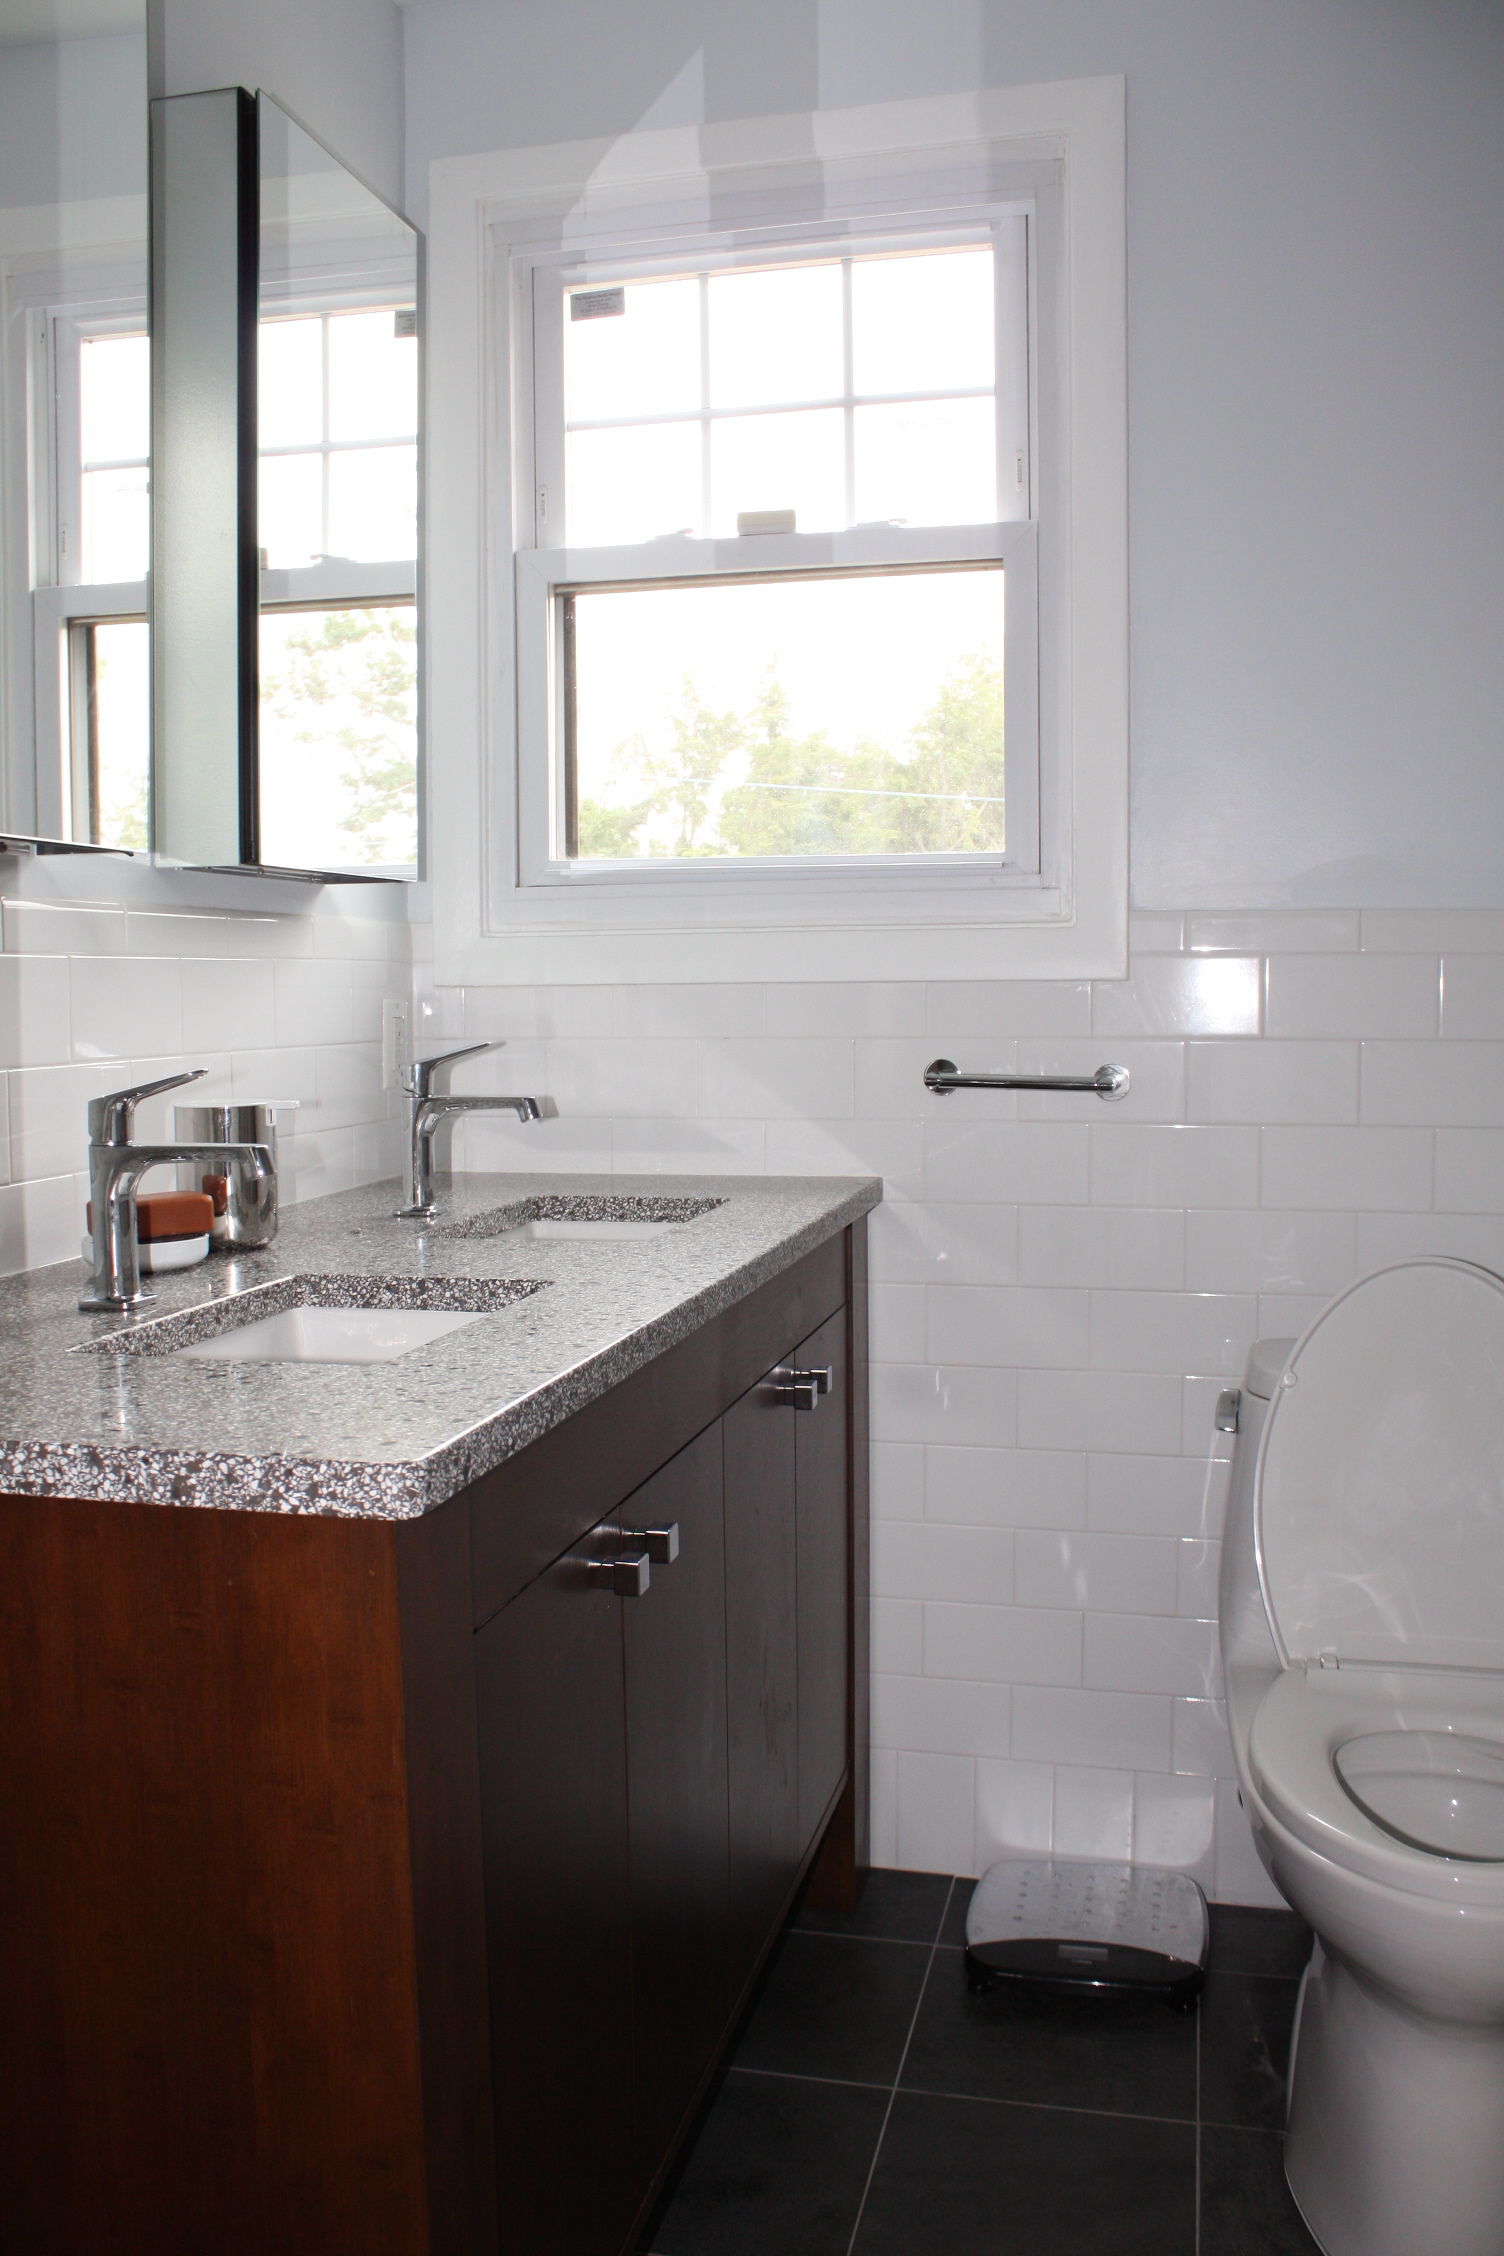 cvisions_bathroom_remodel11.JPG